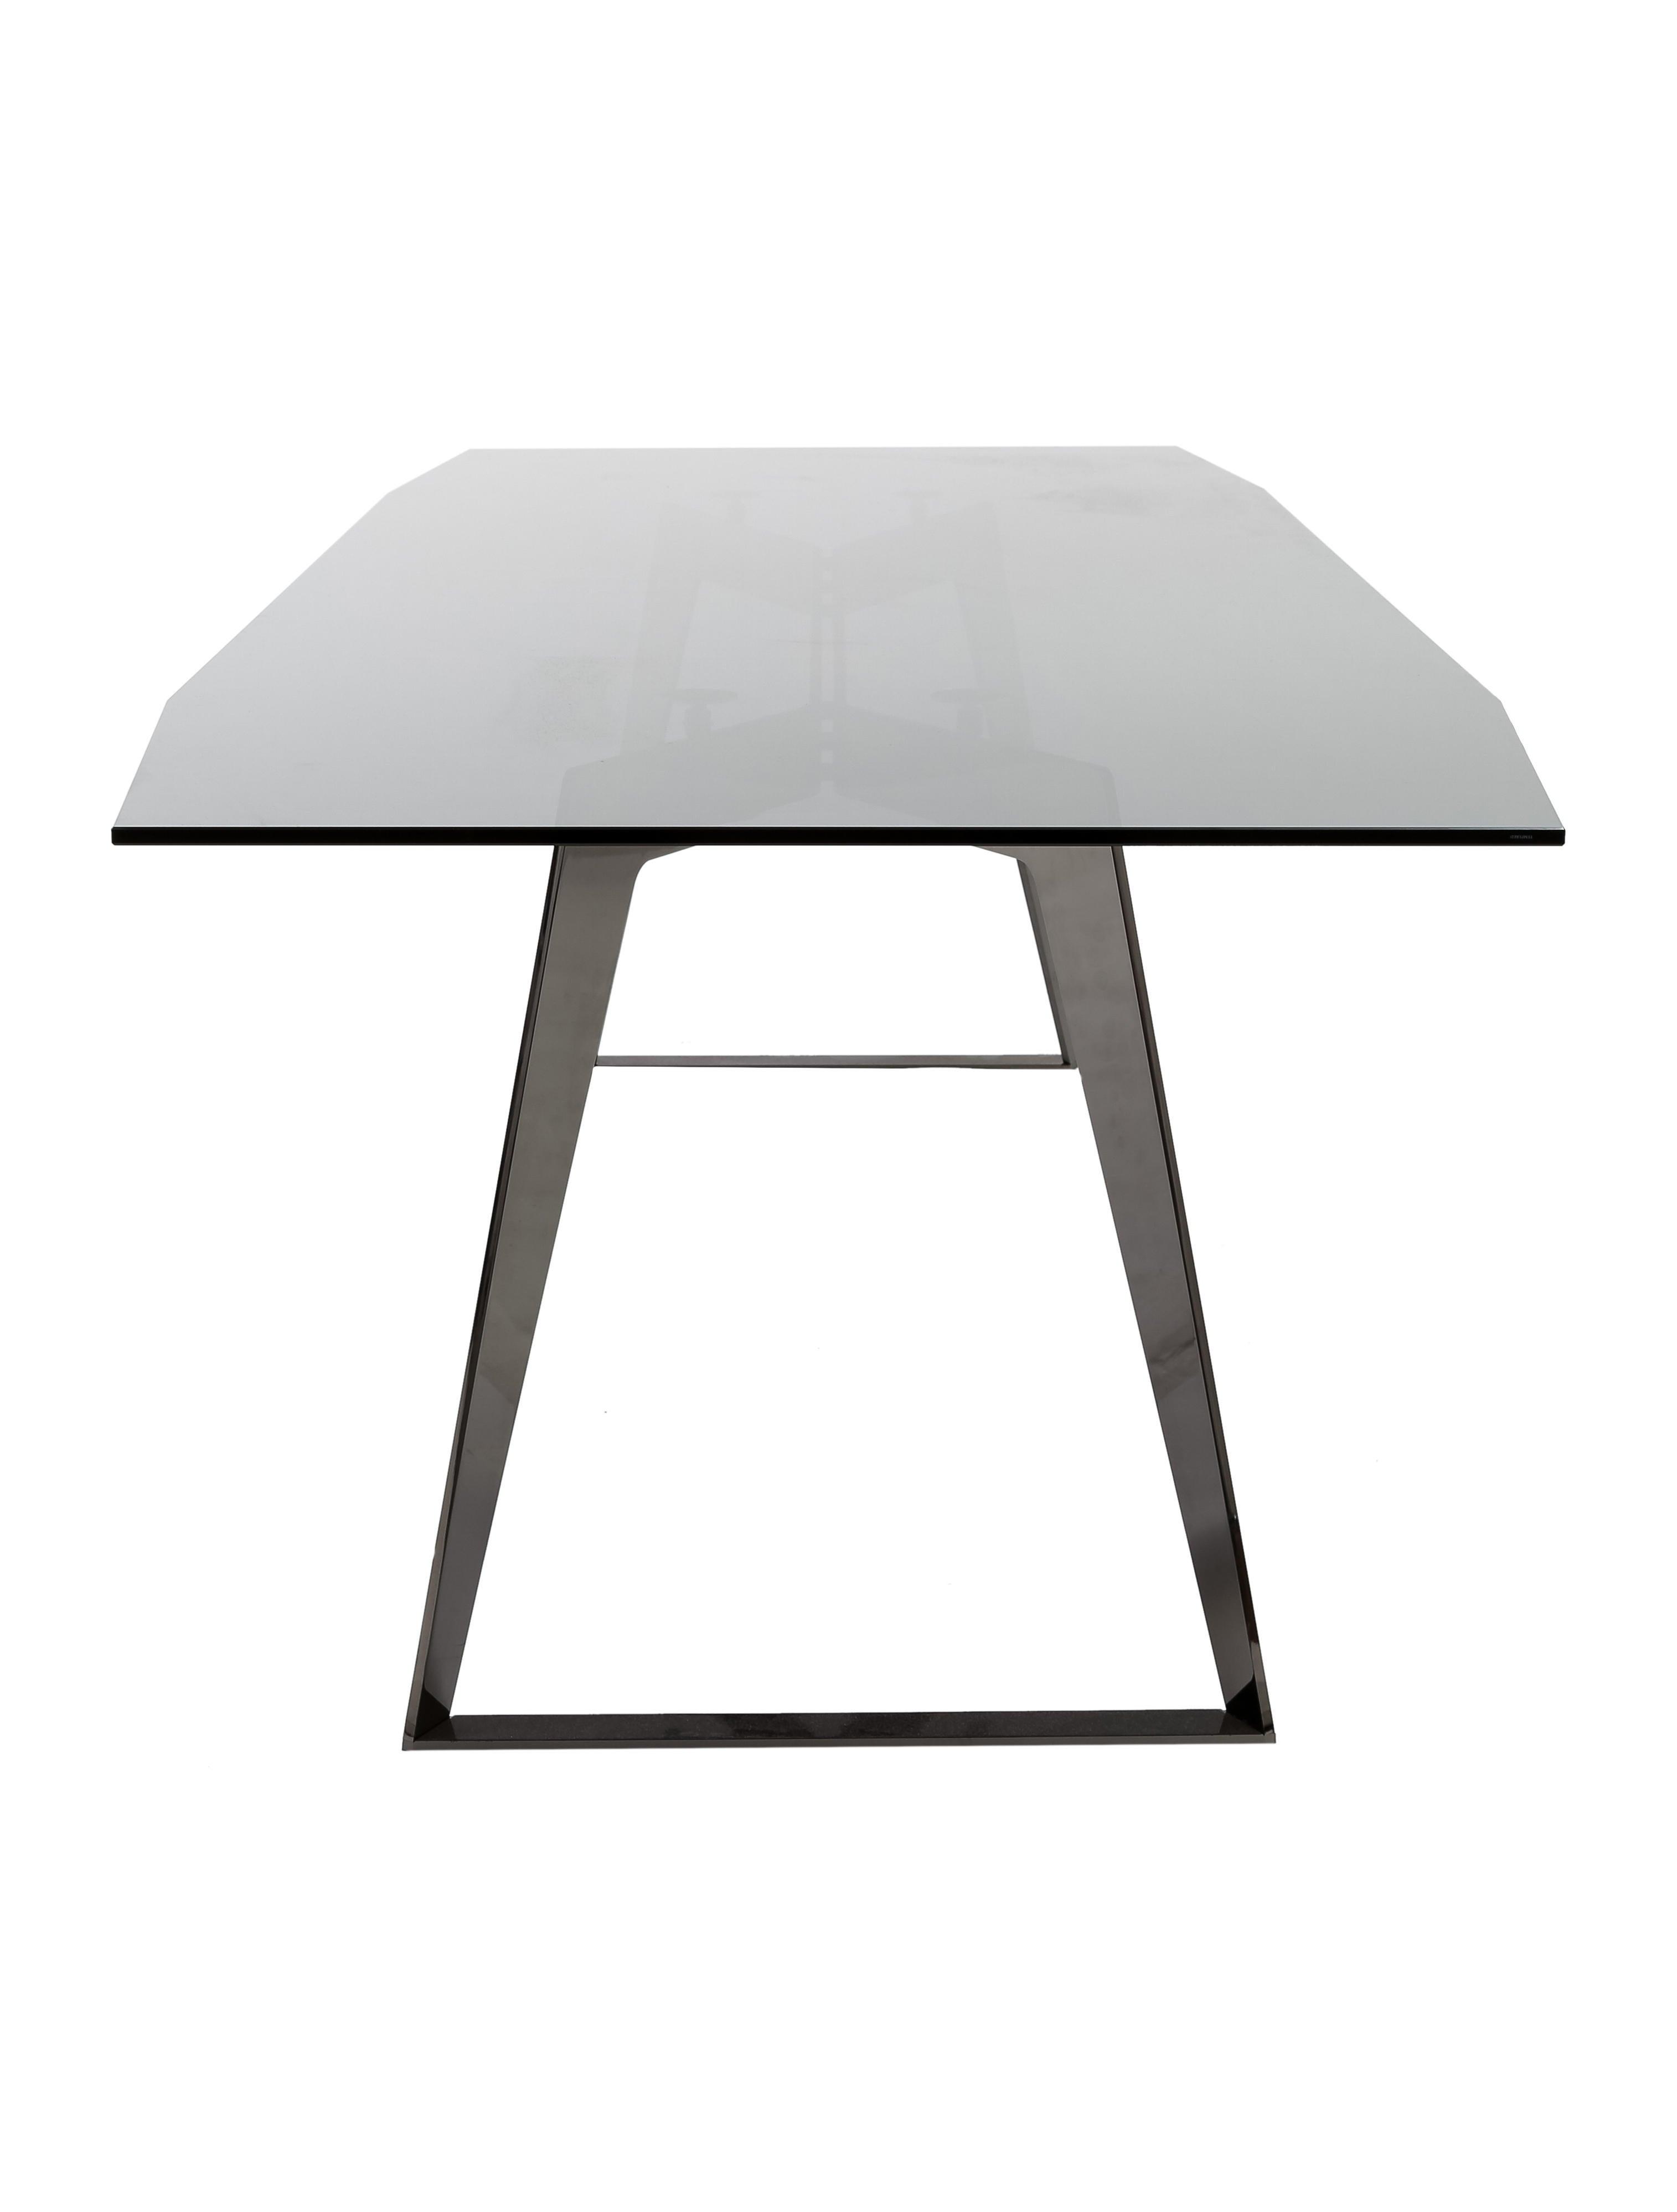 Roche Bobois Glass Dining Table Furniture BOB